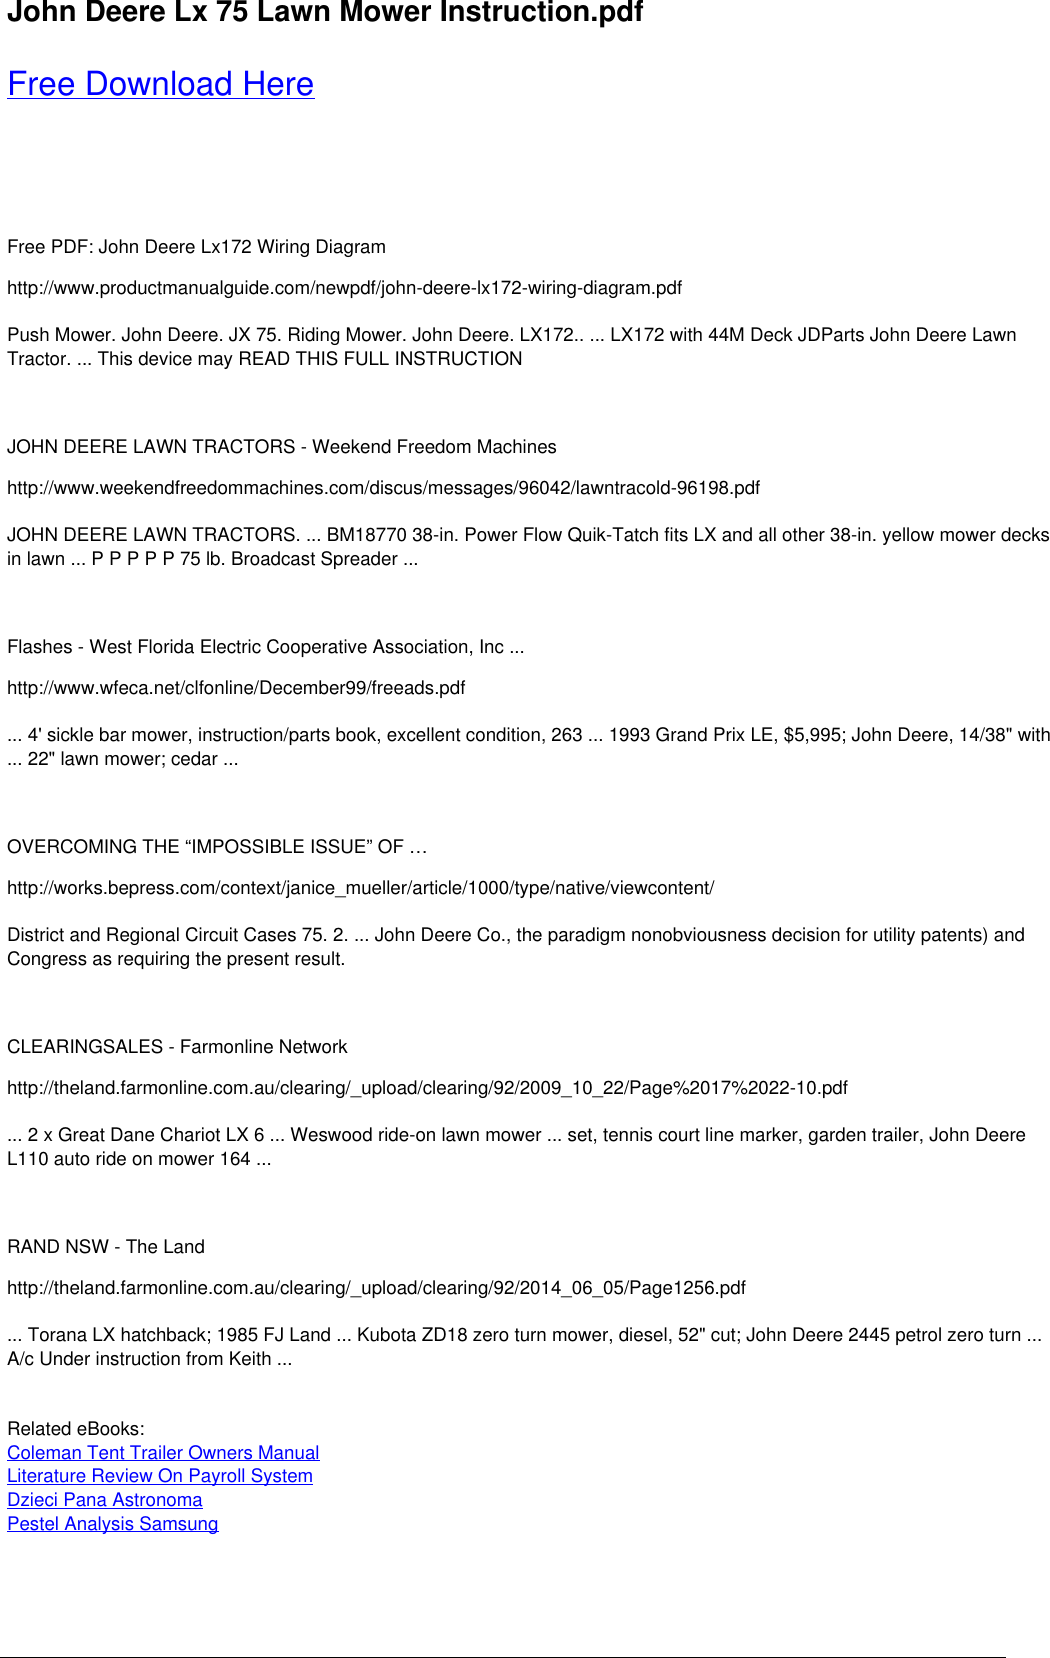 Hp John Deere Lx 75 Lawn Mower Instruction Preview Lx172 Wiring Diagram